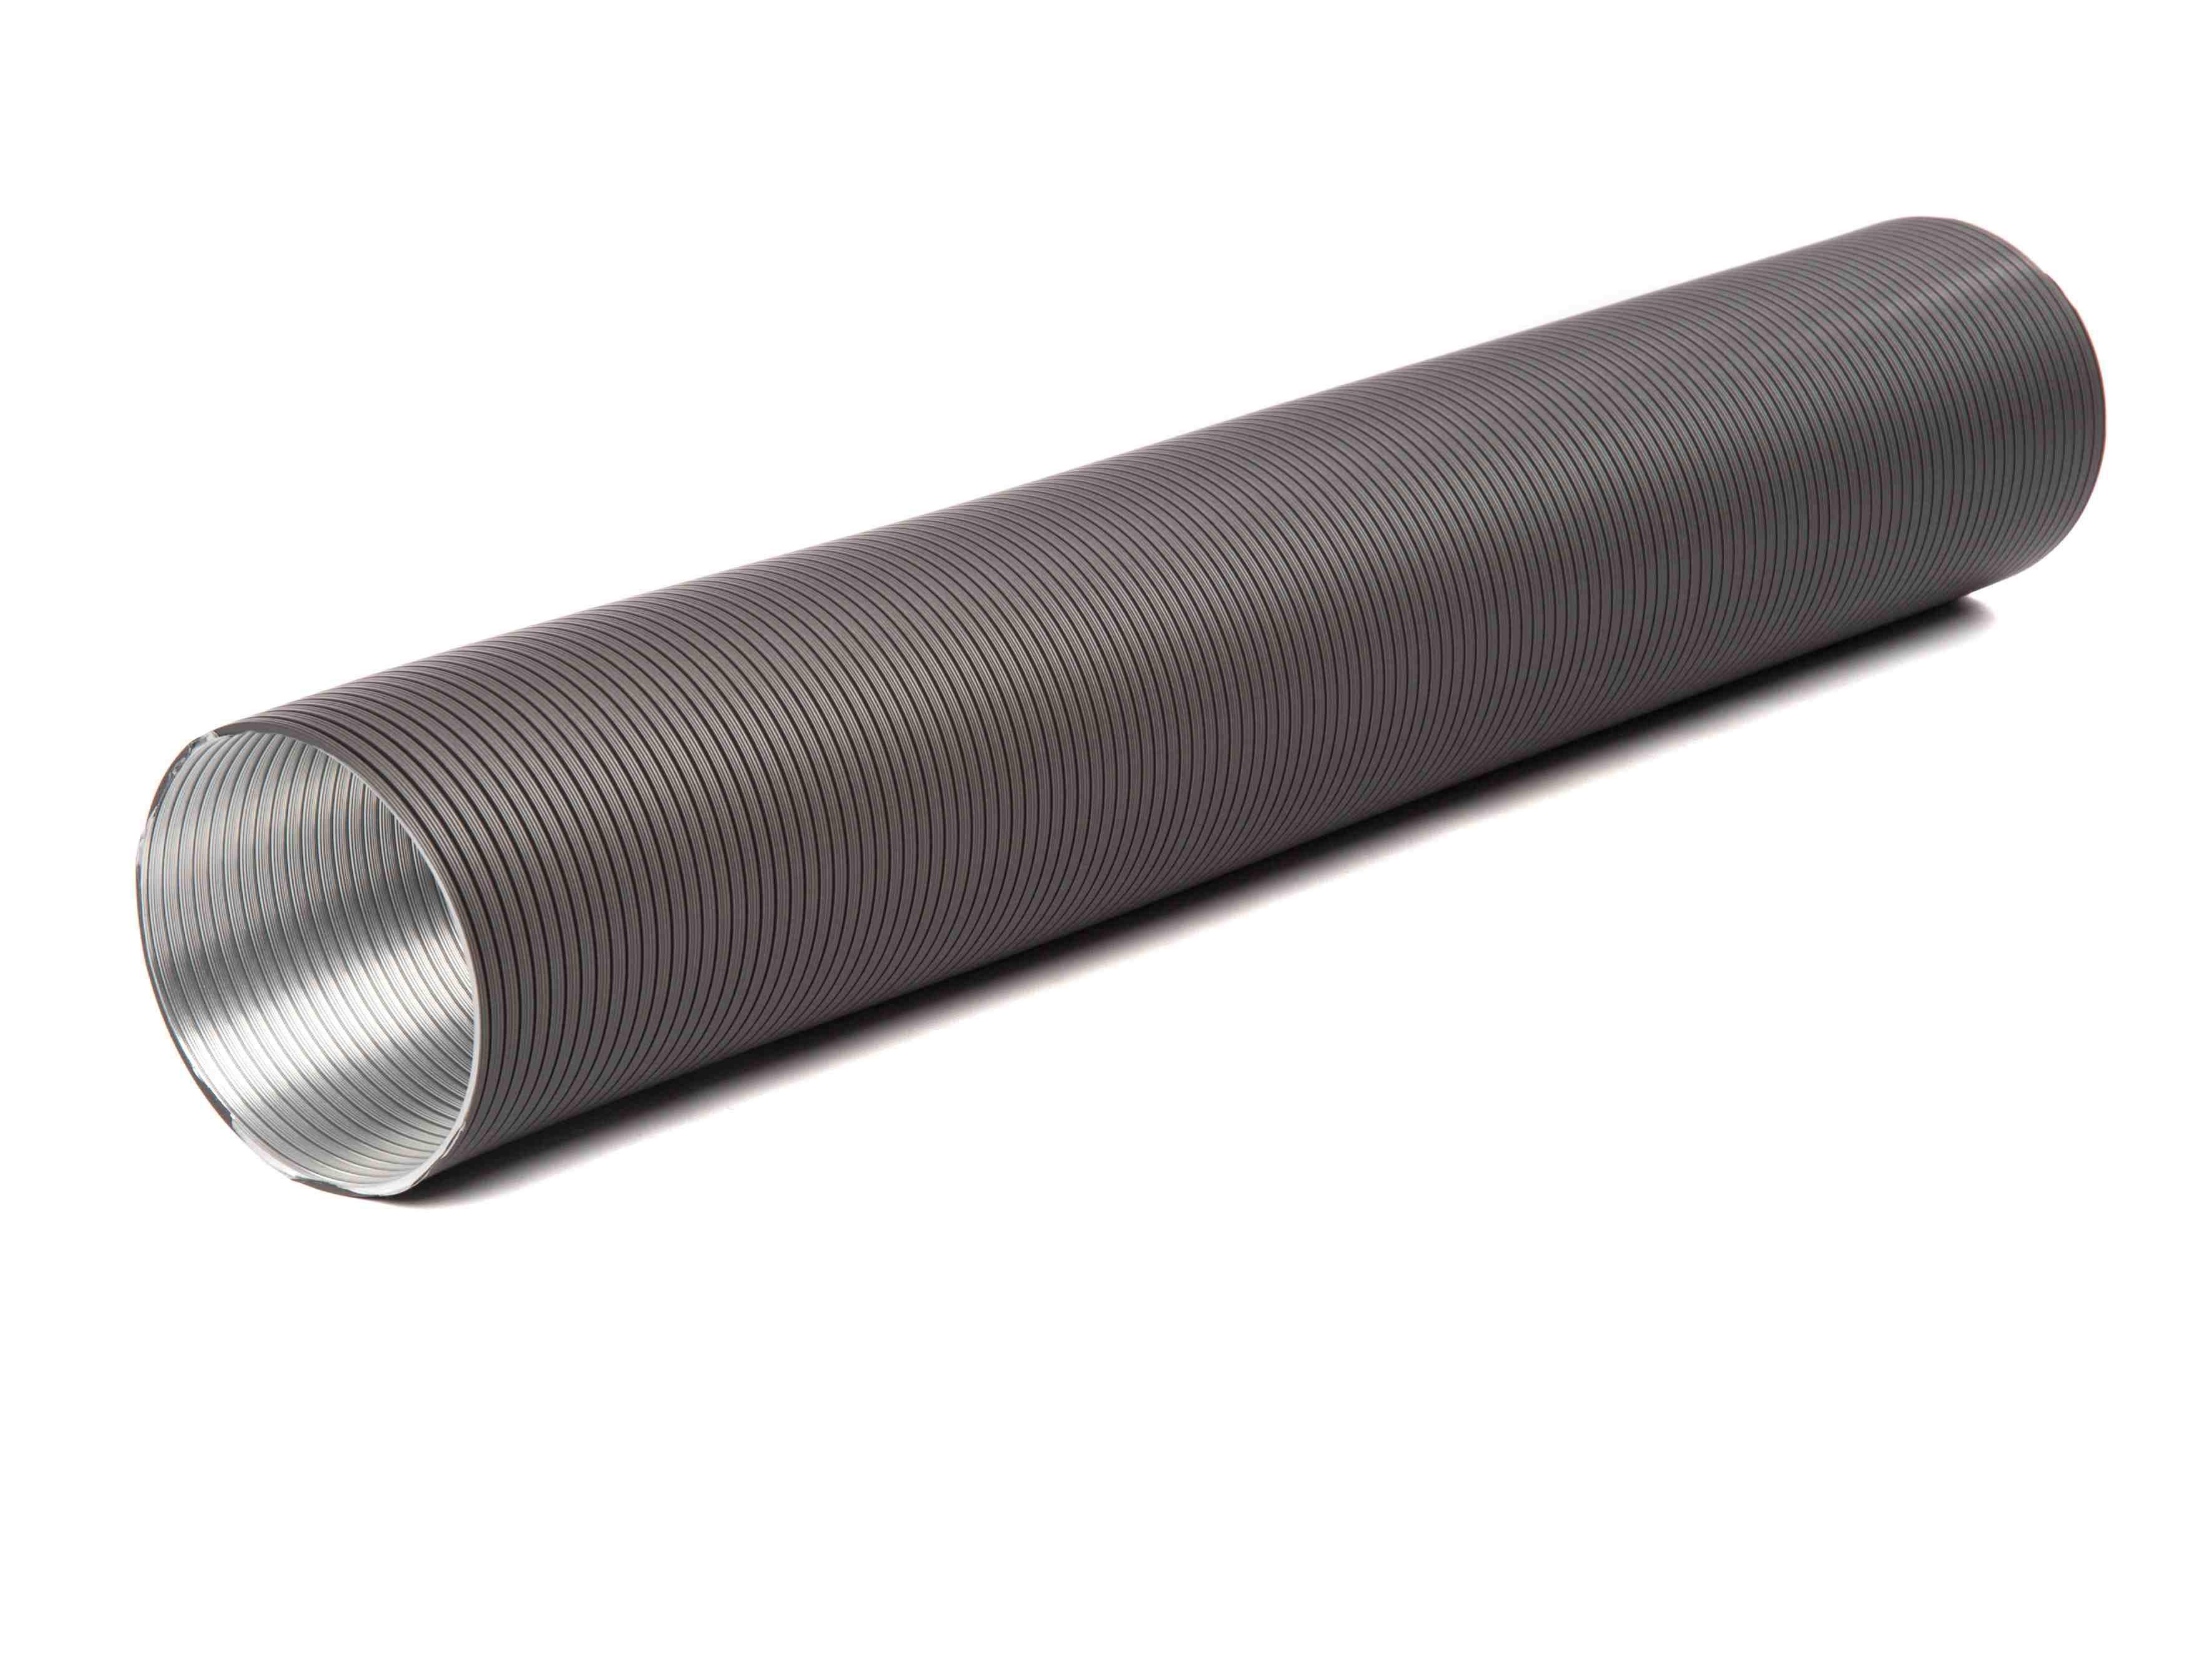 Flexibles Lüftungsrohr aus Aluminium Ø80mm grau Bild 1